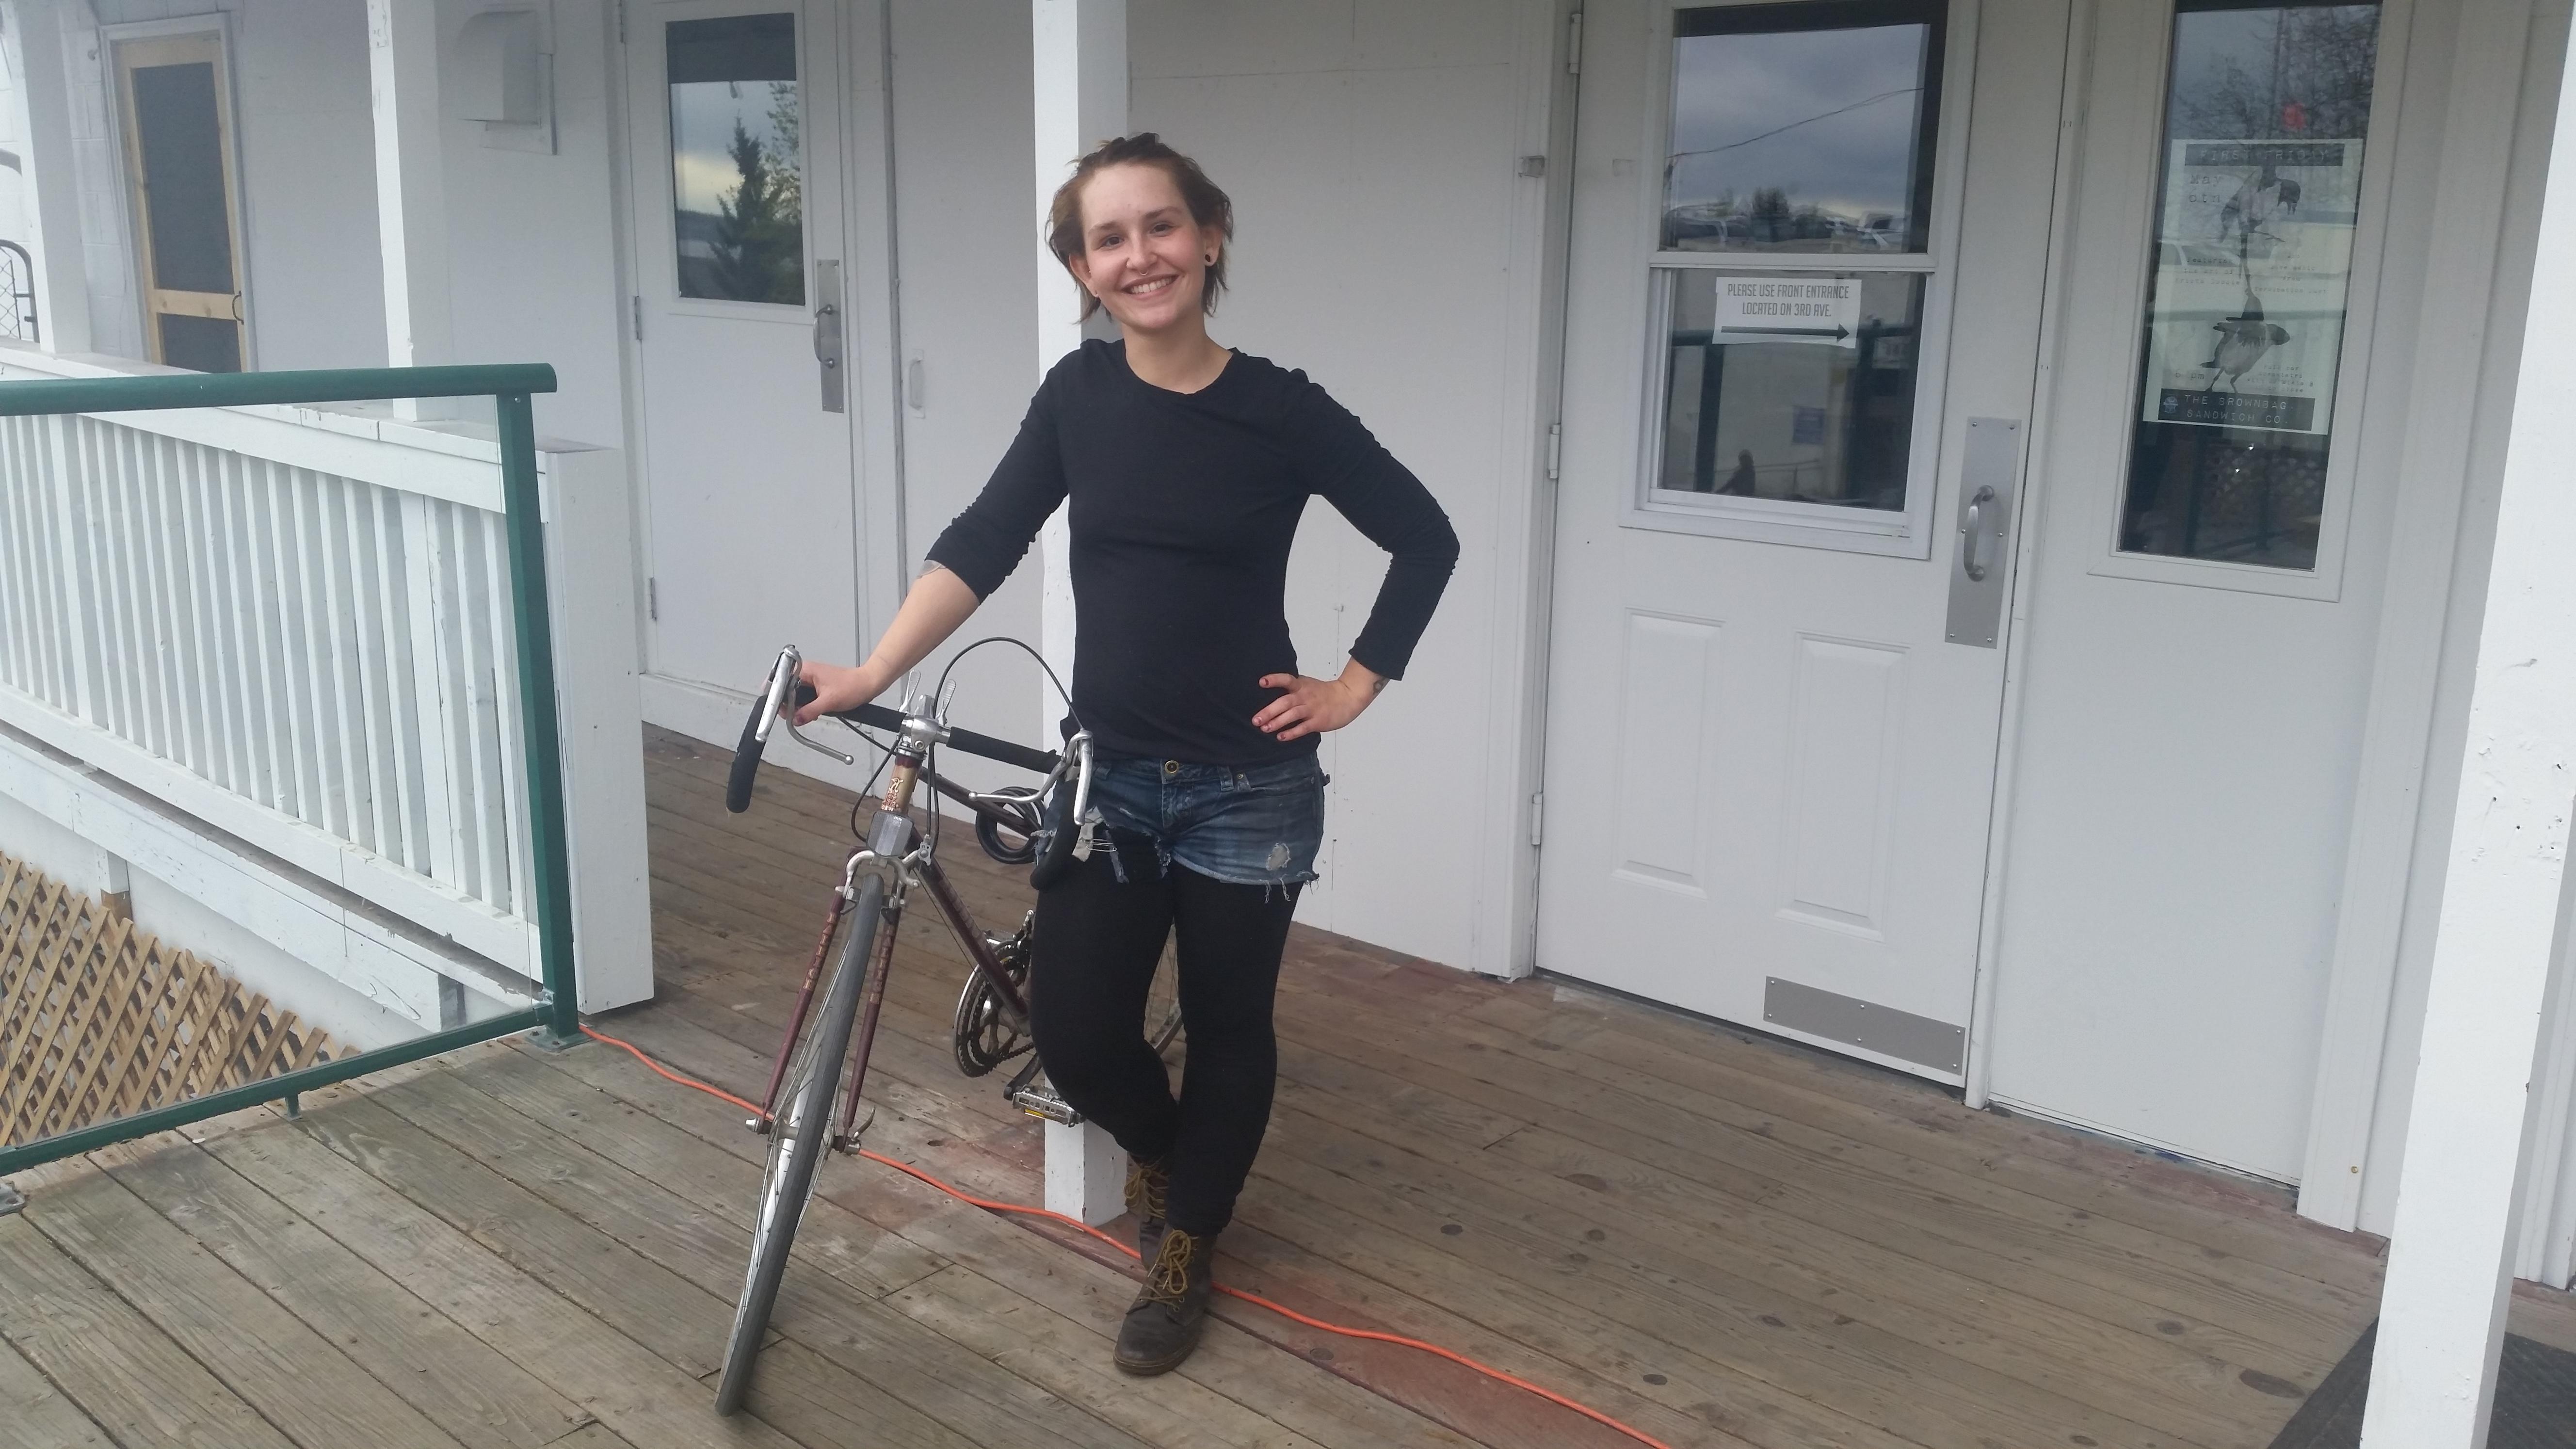 Jenna Holcomb of Anchorage (Photo by Zoe Sobel, KUCB - Unalaska)